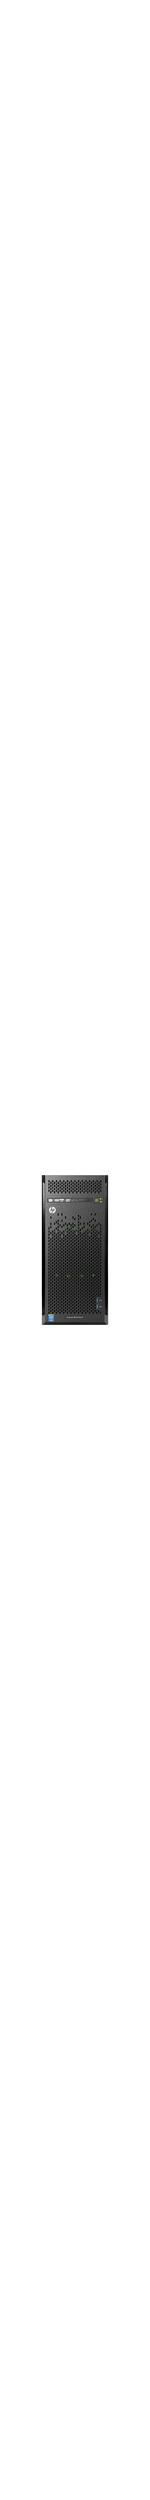 HP ProLiant ML110 G9 4.5U Tower Server - 1 x Intel Xeon E5-2603 v3 Hexa-core 6 Core 1.60 GHz